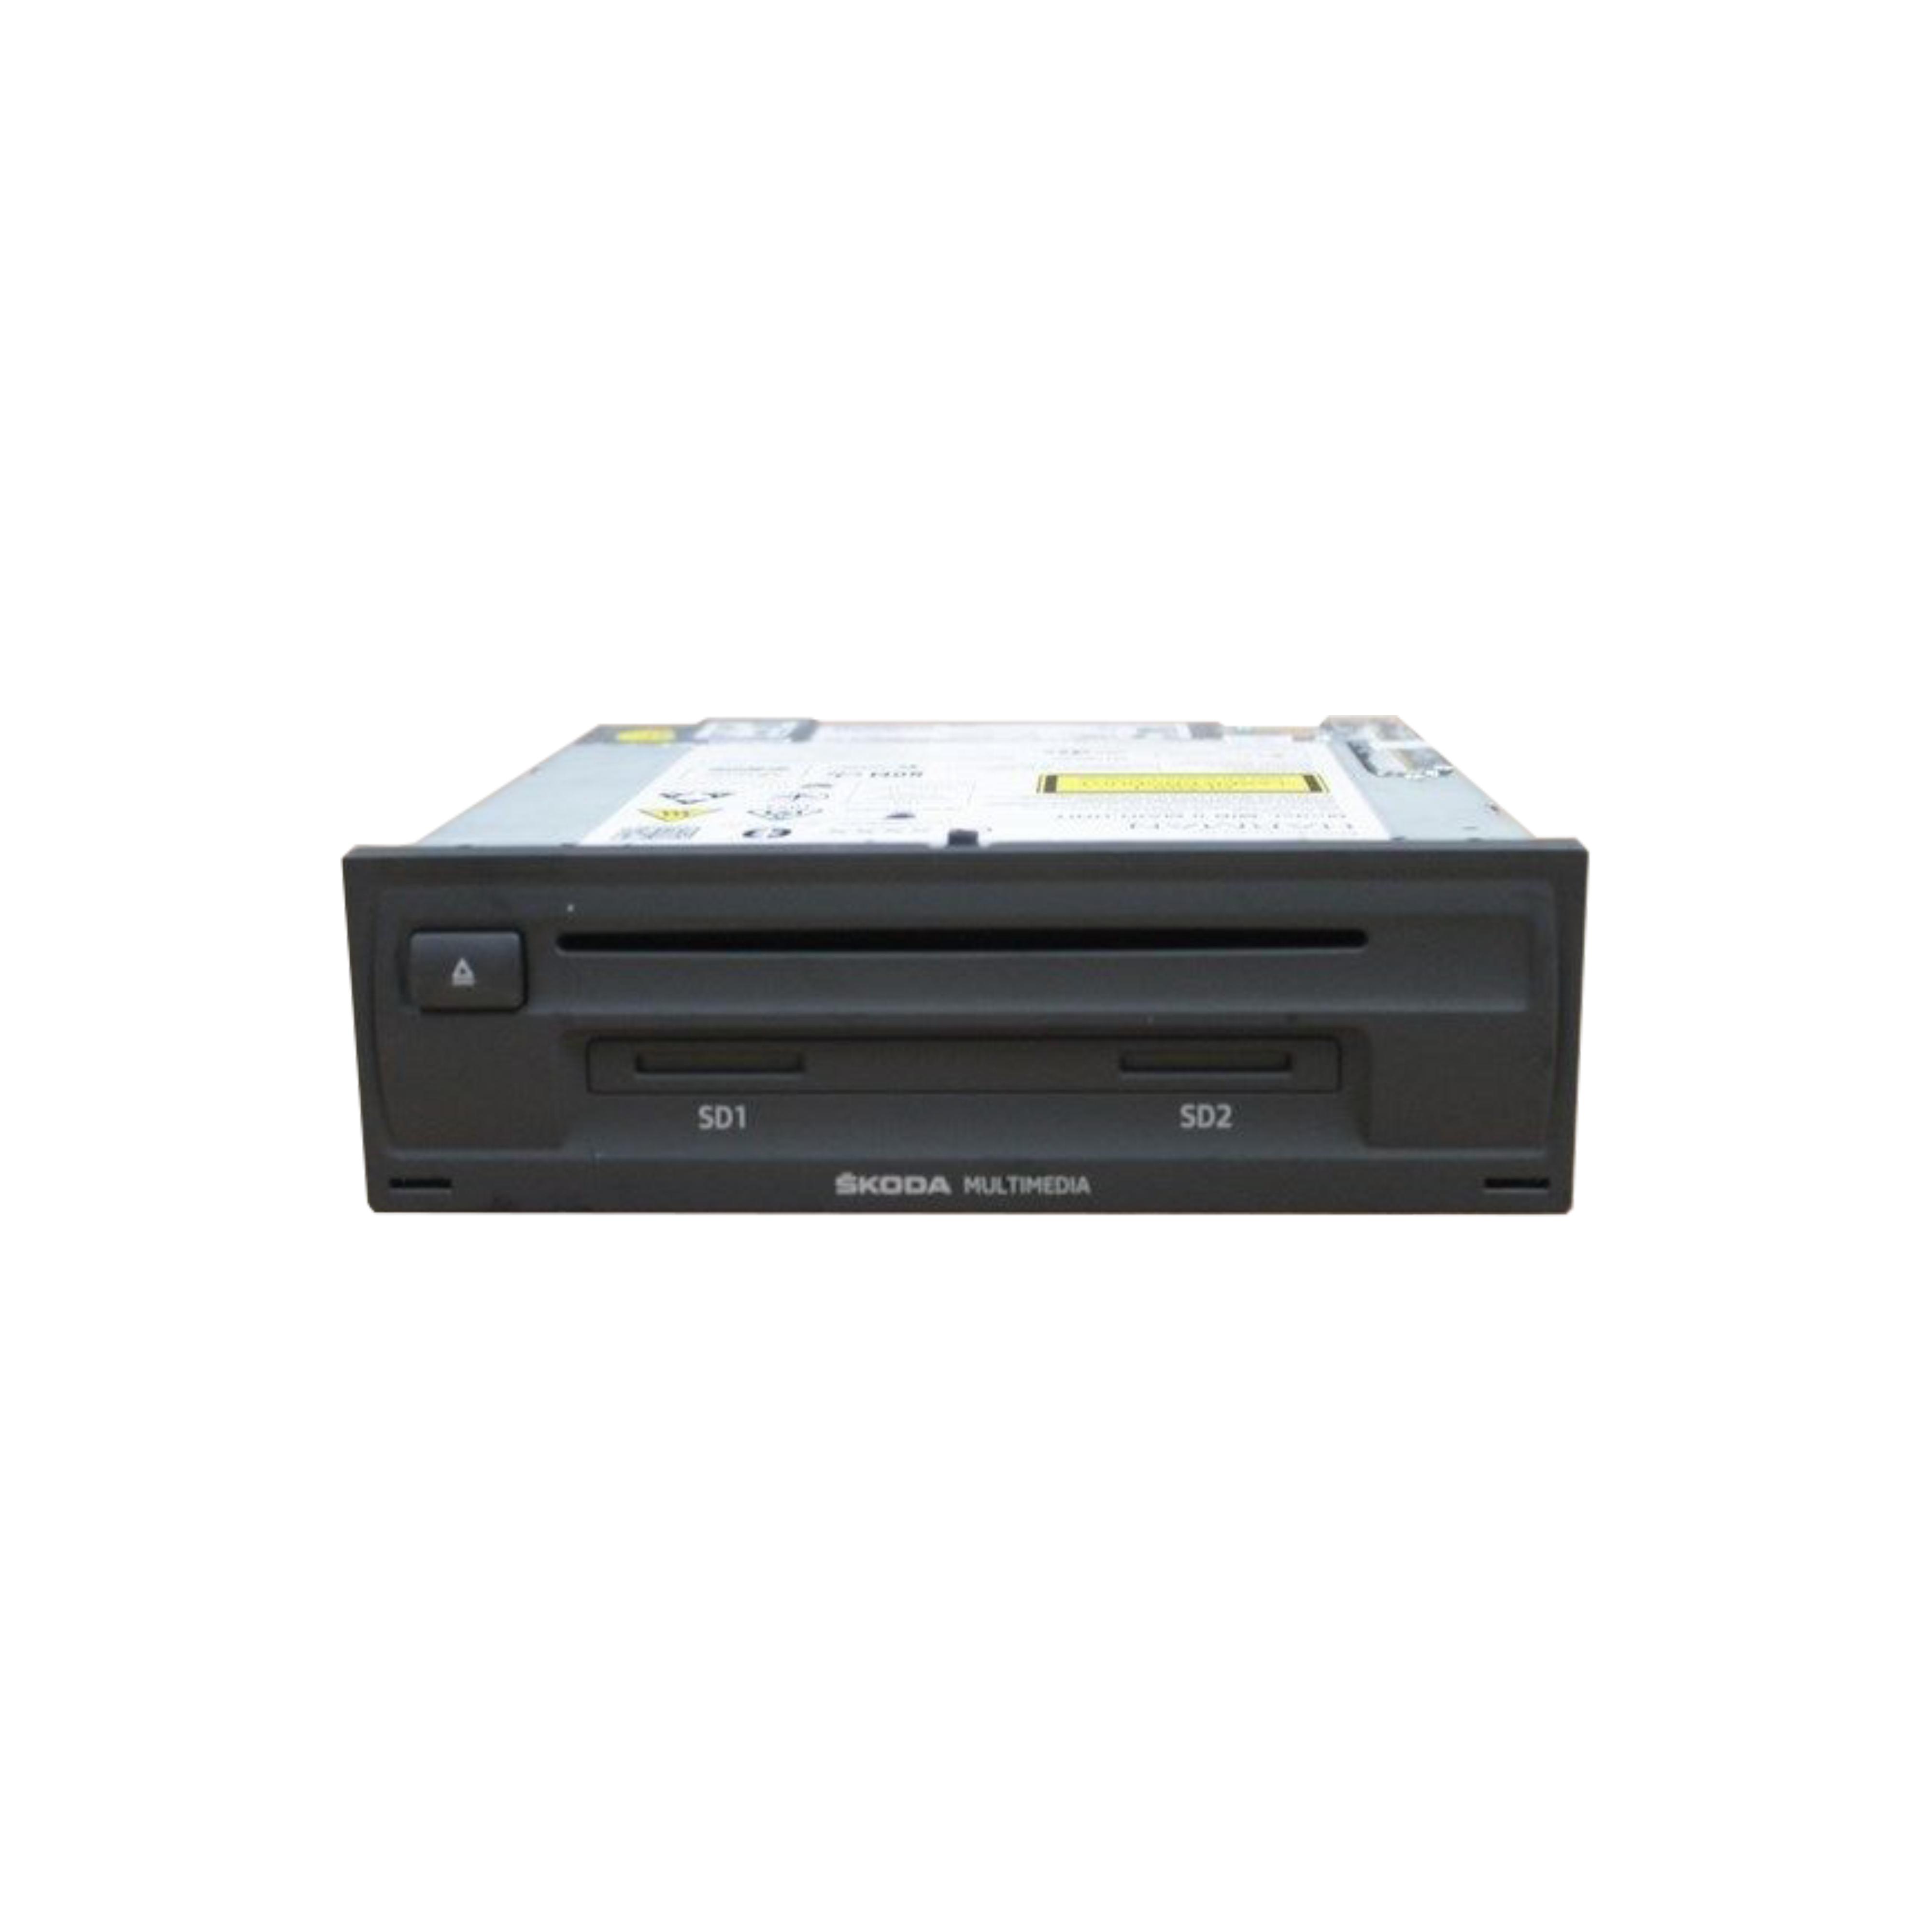 APG | Multimedia systems upgrade - Upgrade solutios